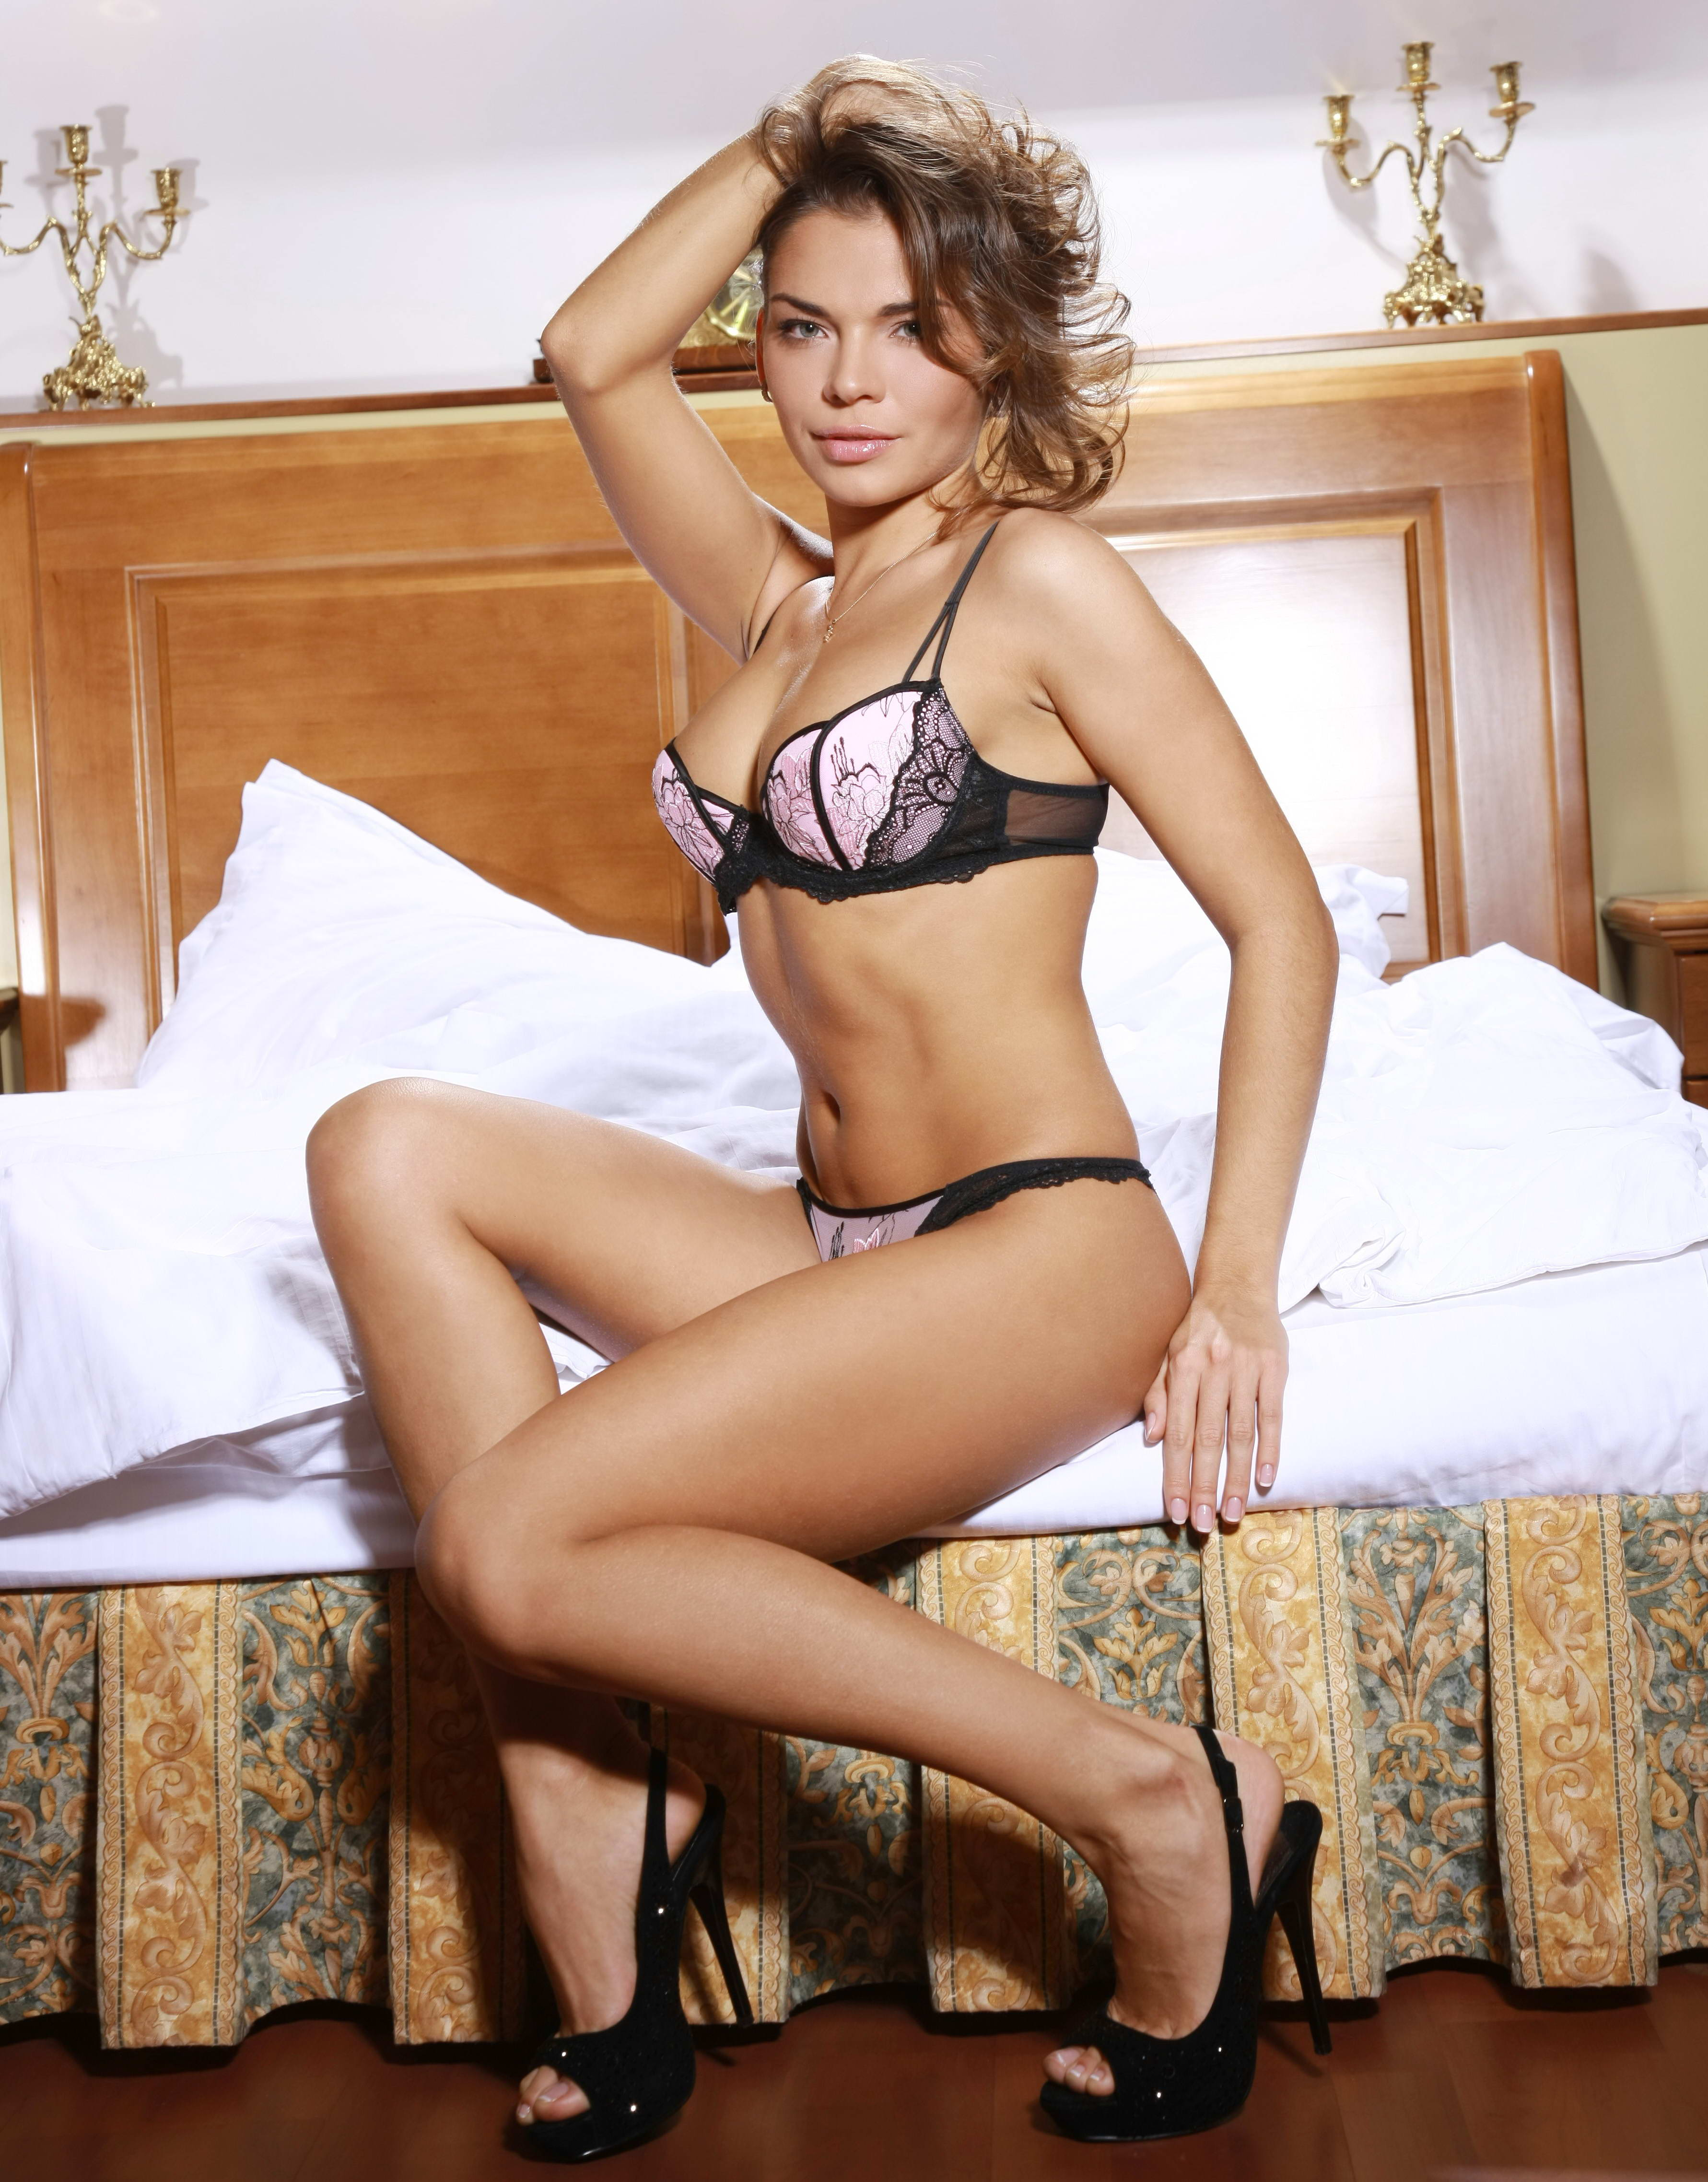 Sexy Flirty Escort From 123LondonEscorts